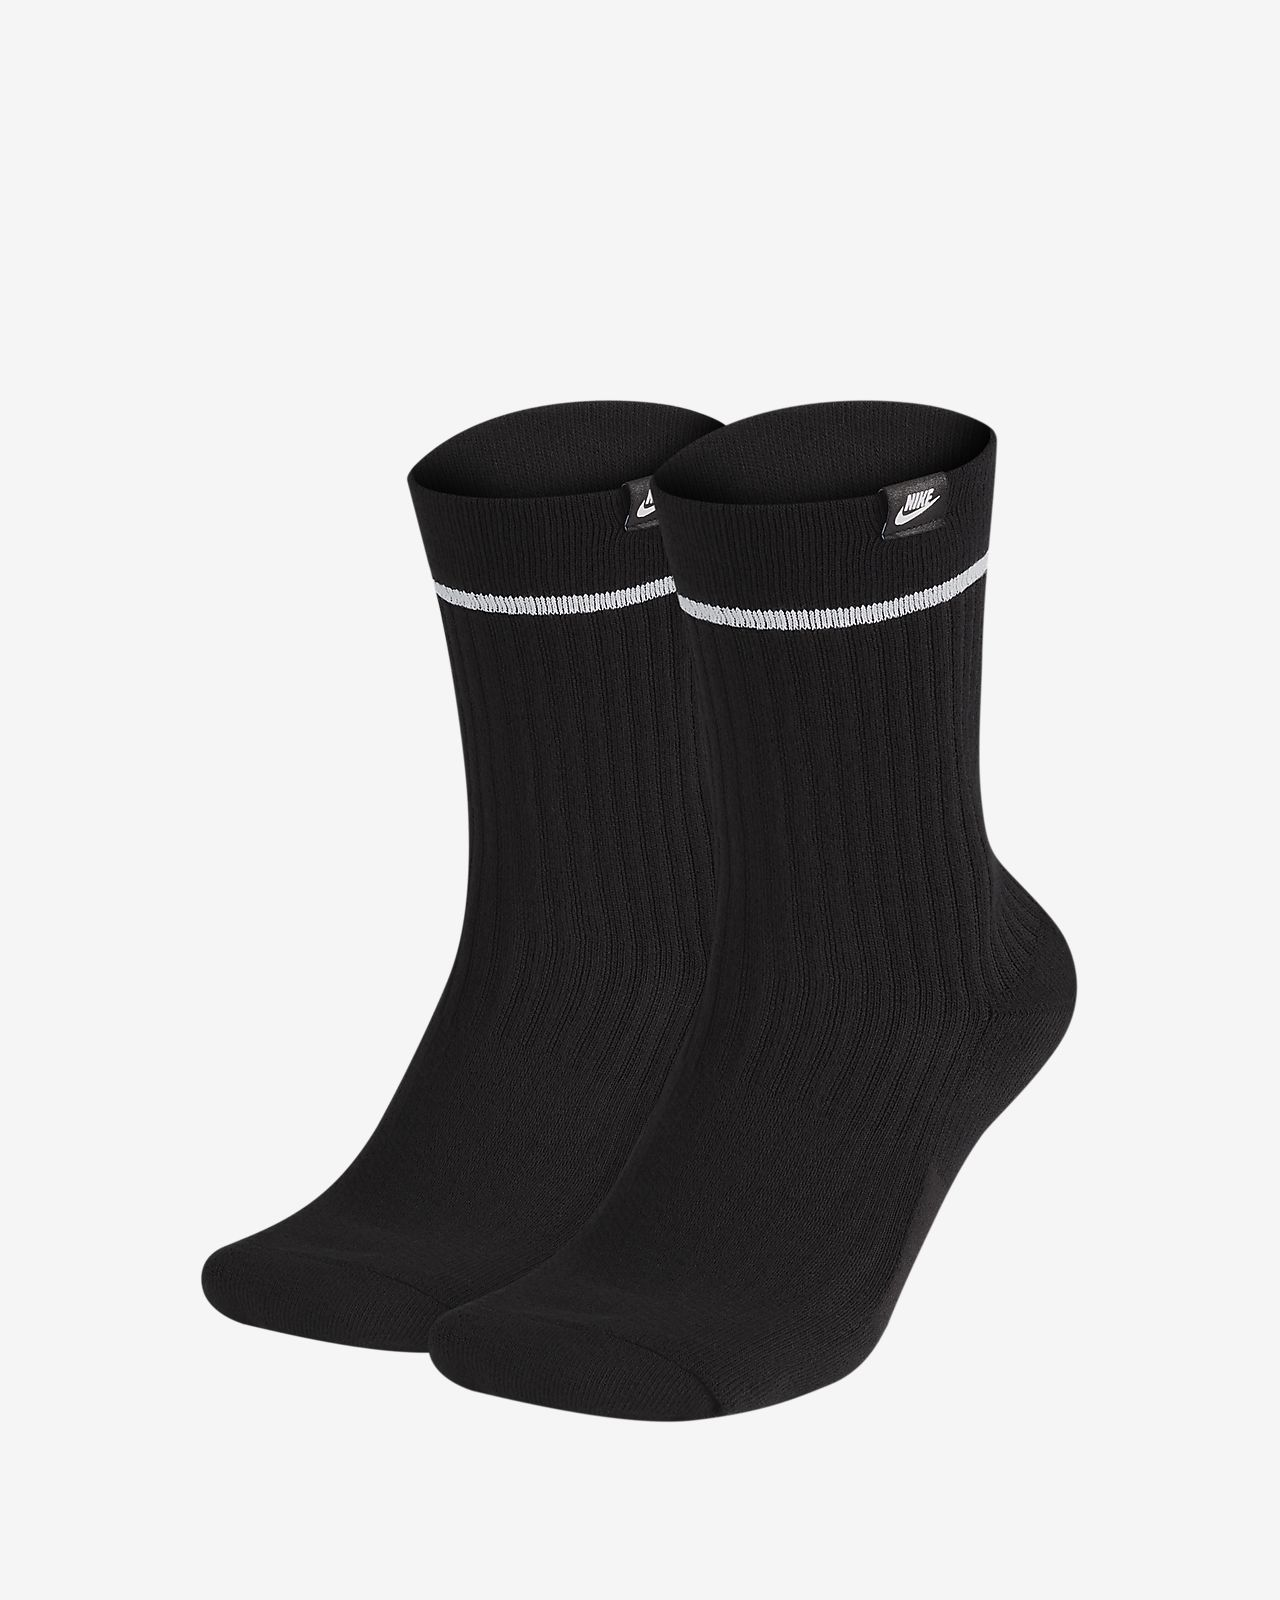 Nike SNKR Sox Essential 中筒襪 (2 雙)